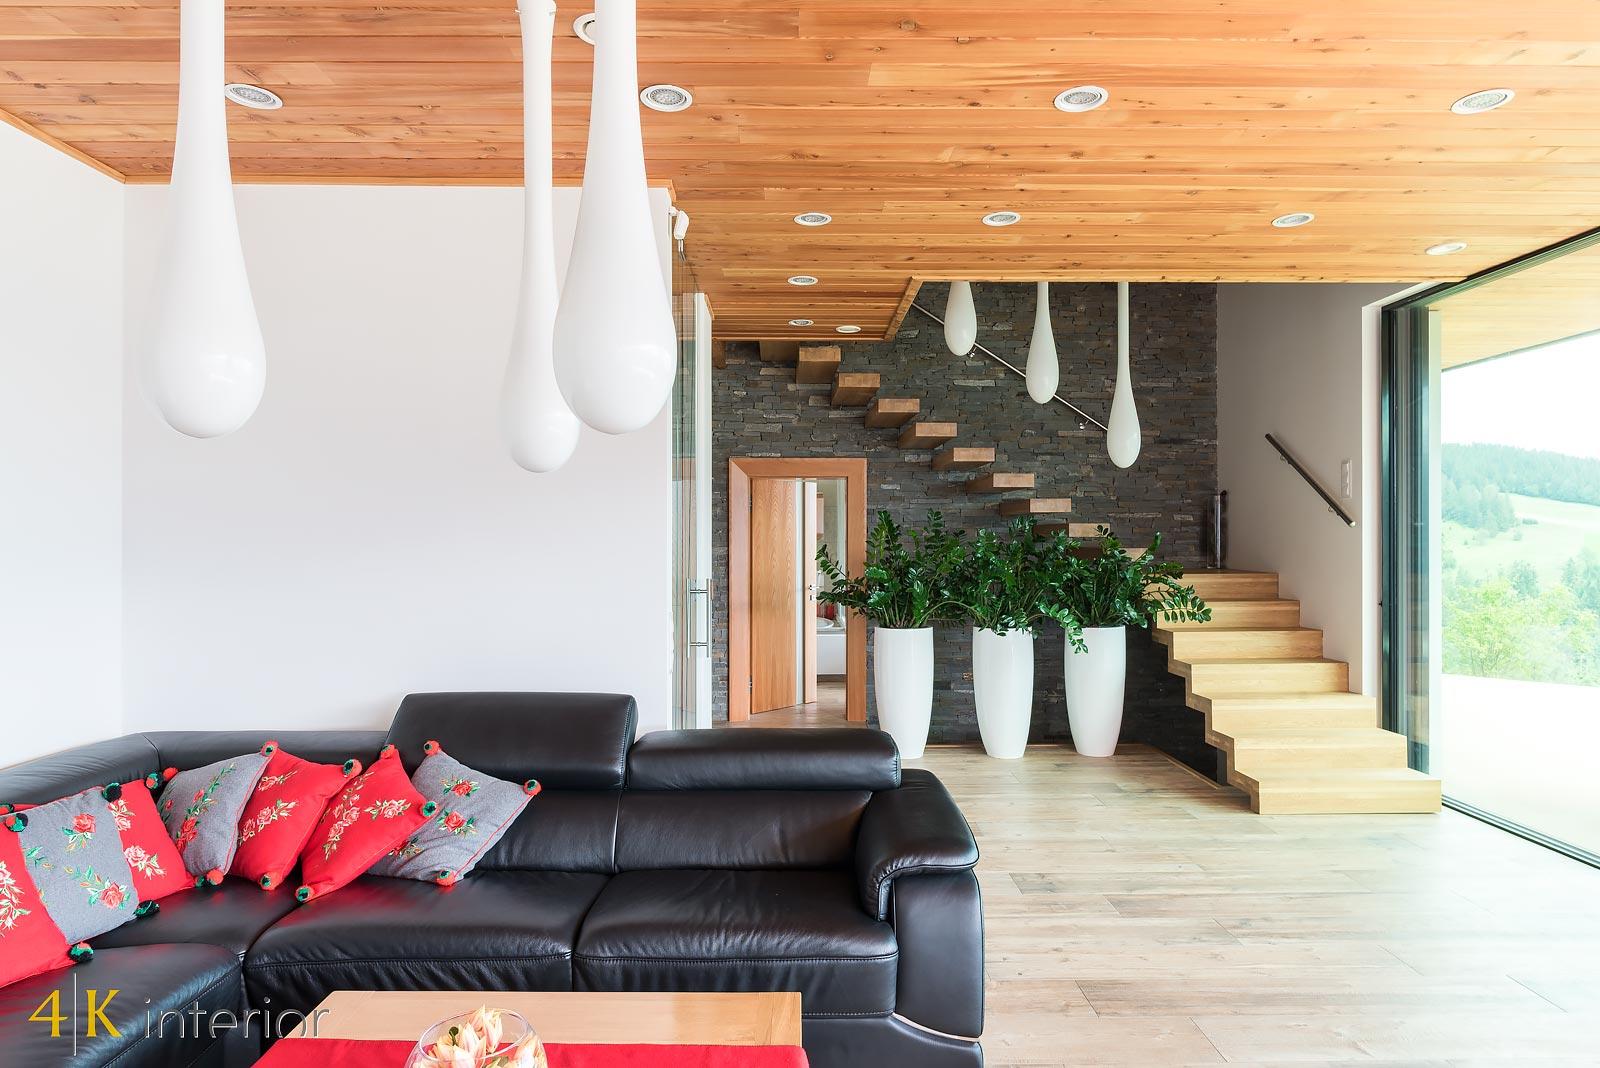 Dom-z-góralskim-charakterem-17 kanapa z licencją na odpoczynek n